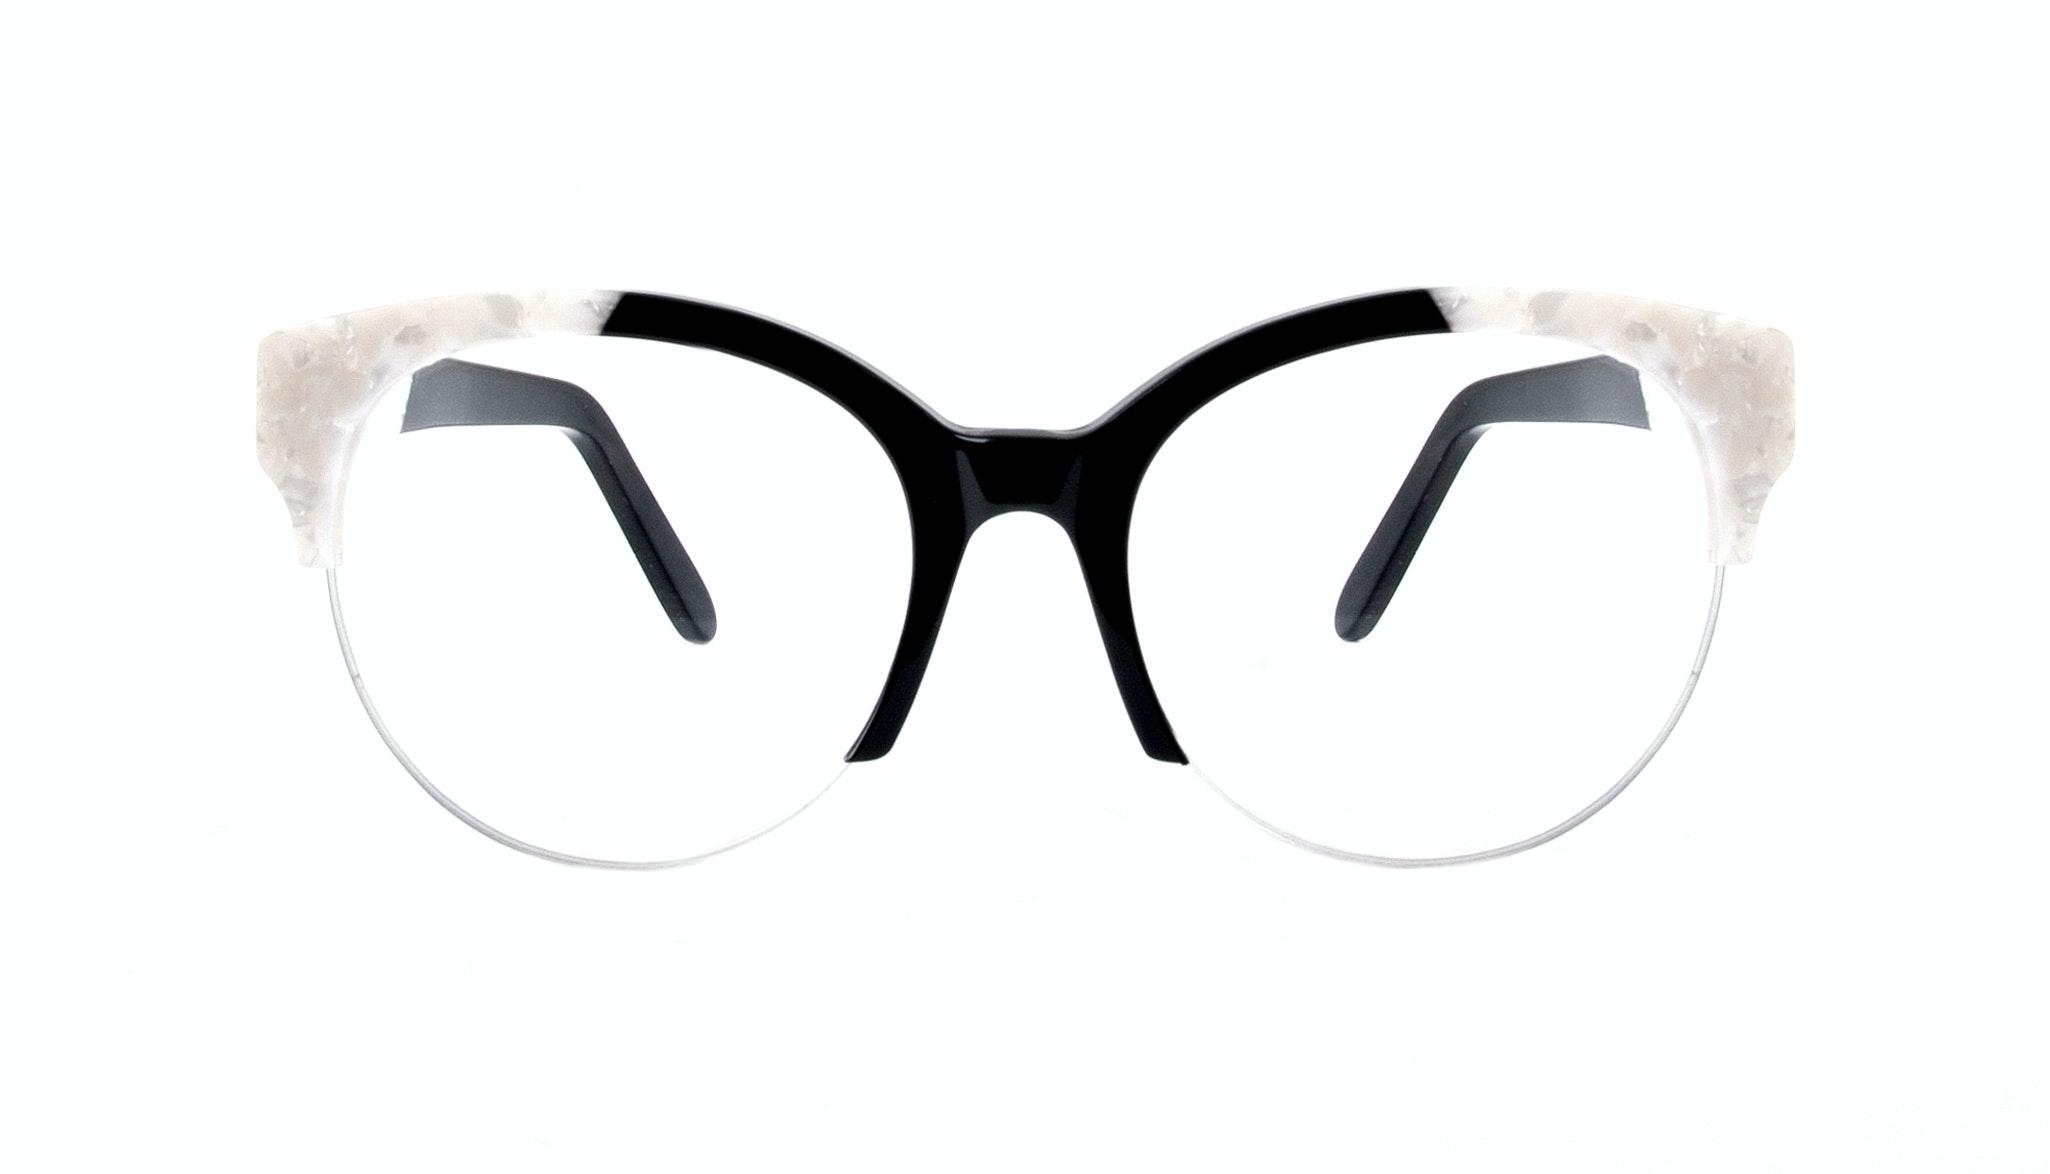 Affordable Fashion Glasses Cat Eye Round Semi-Rimless Eyeglasses Women Eclipse Light Onyx Pearl Front